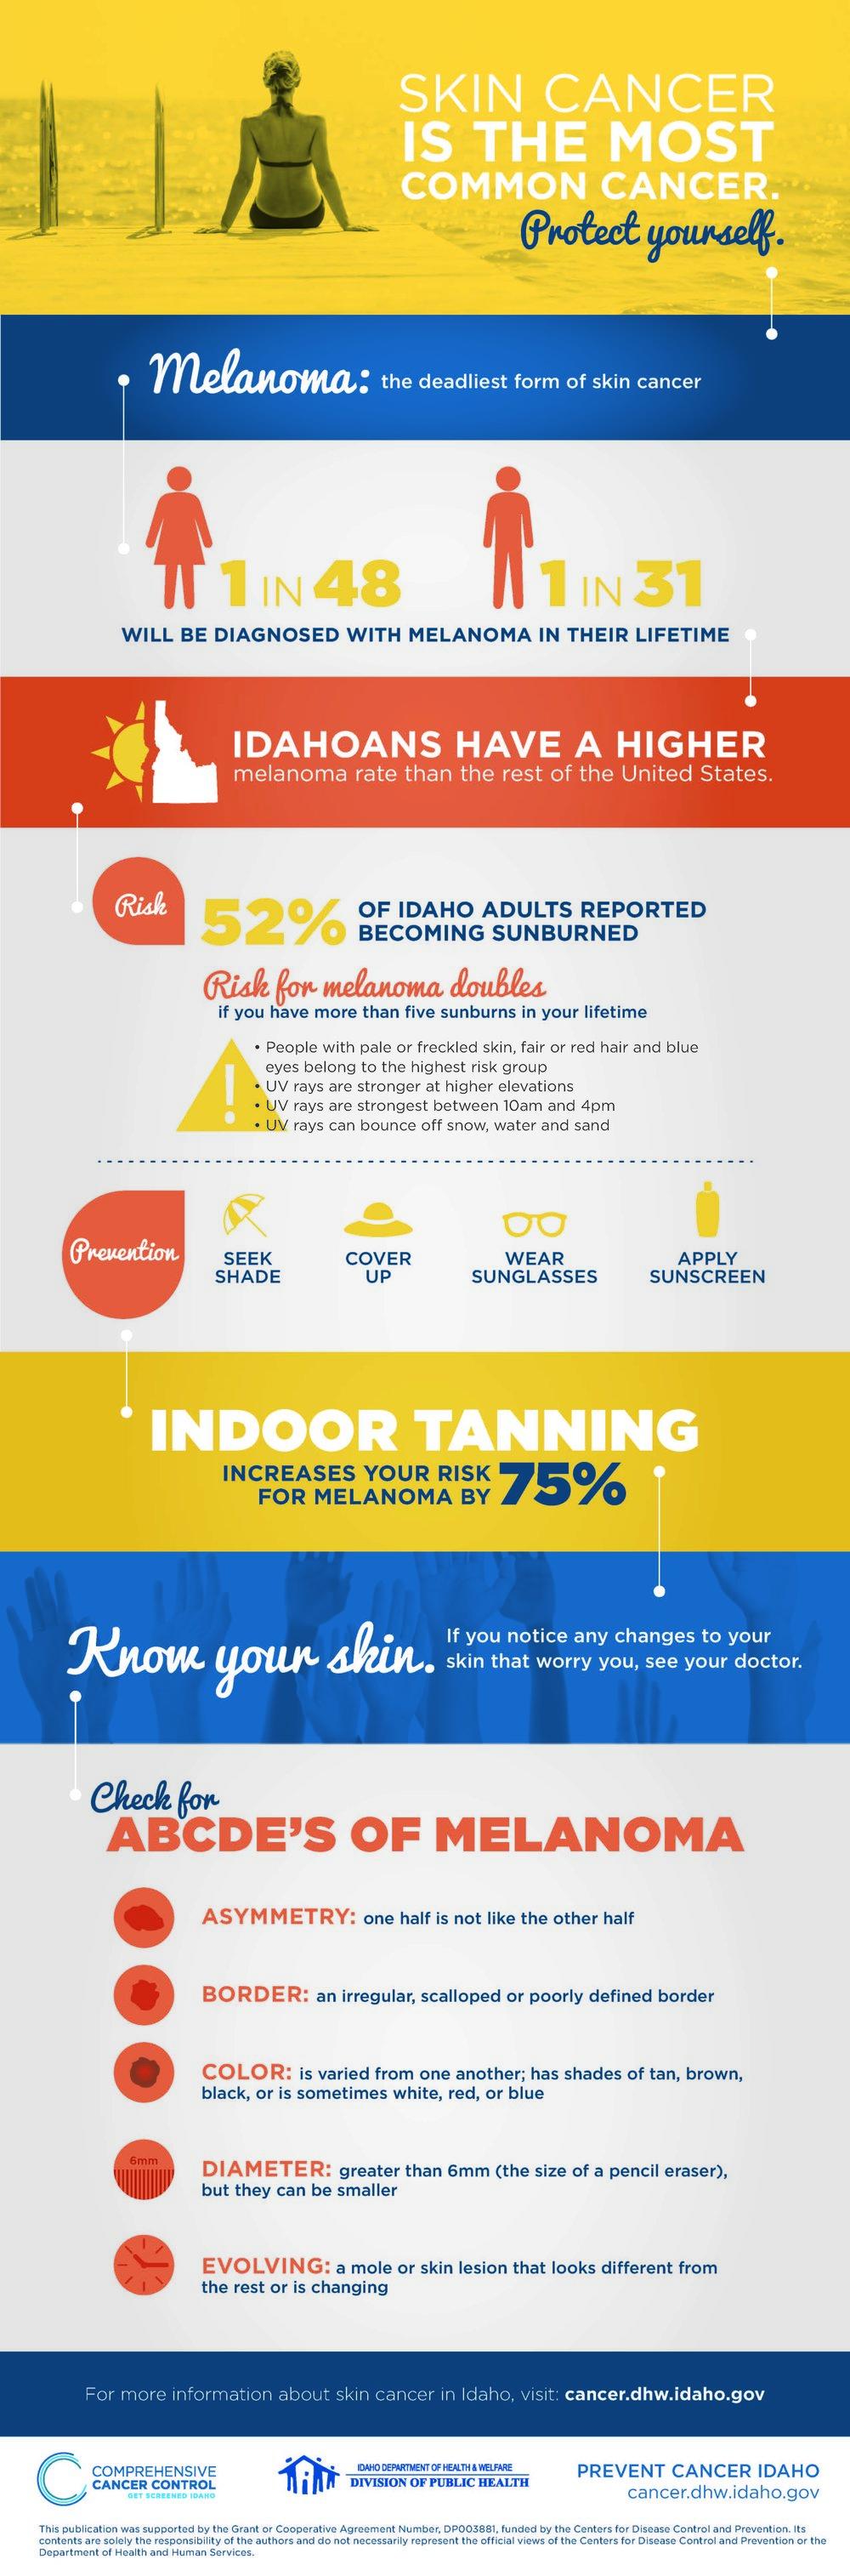 8795_Comp Cancer-Skin Cancer Infographic-FINAL-2.jpg